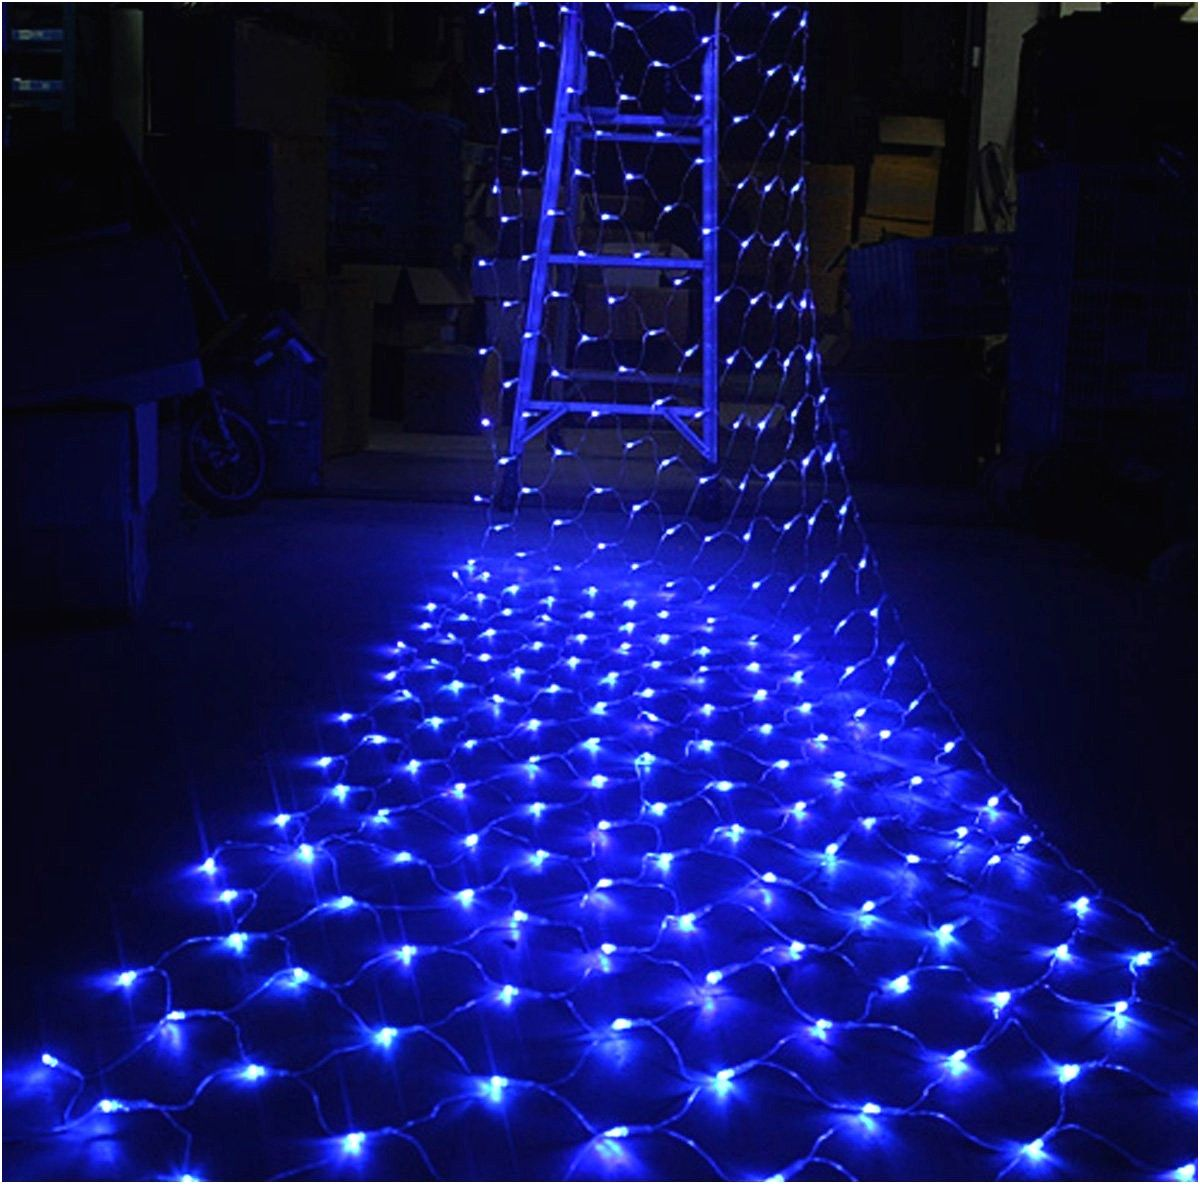 18 Premium Guirlande Lumineuse Boule Ikea Pictures